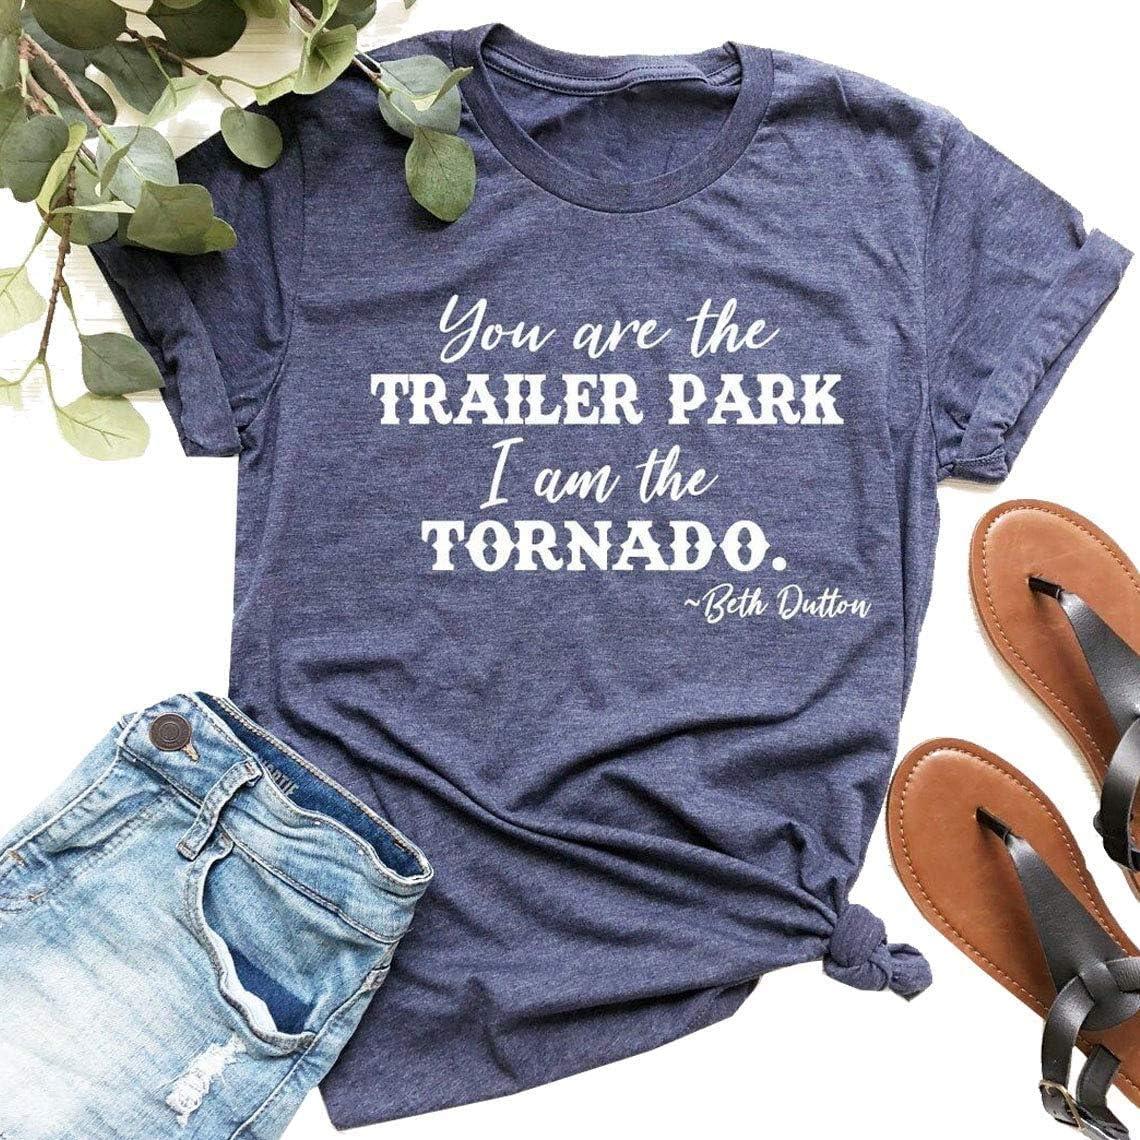 Yellowstone Shirt You are The Trailer Park I am The Tornado T Shirt Beth Dutton Shirt Women Casual Letter Print T Shirt Top